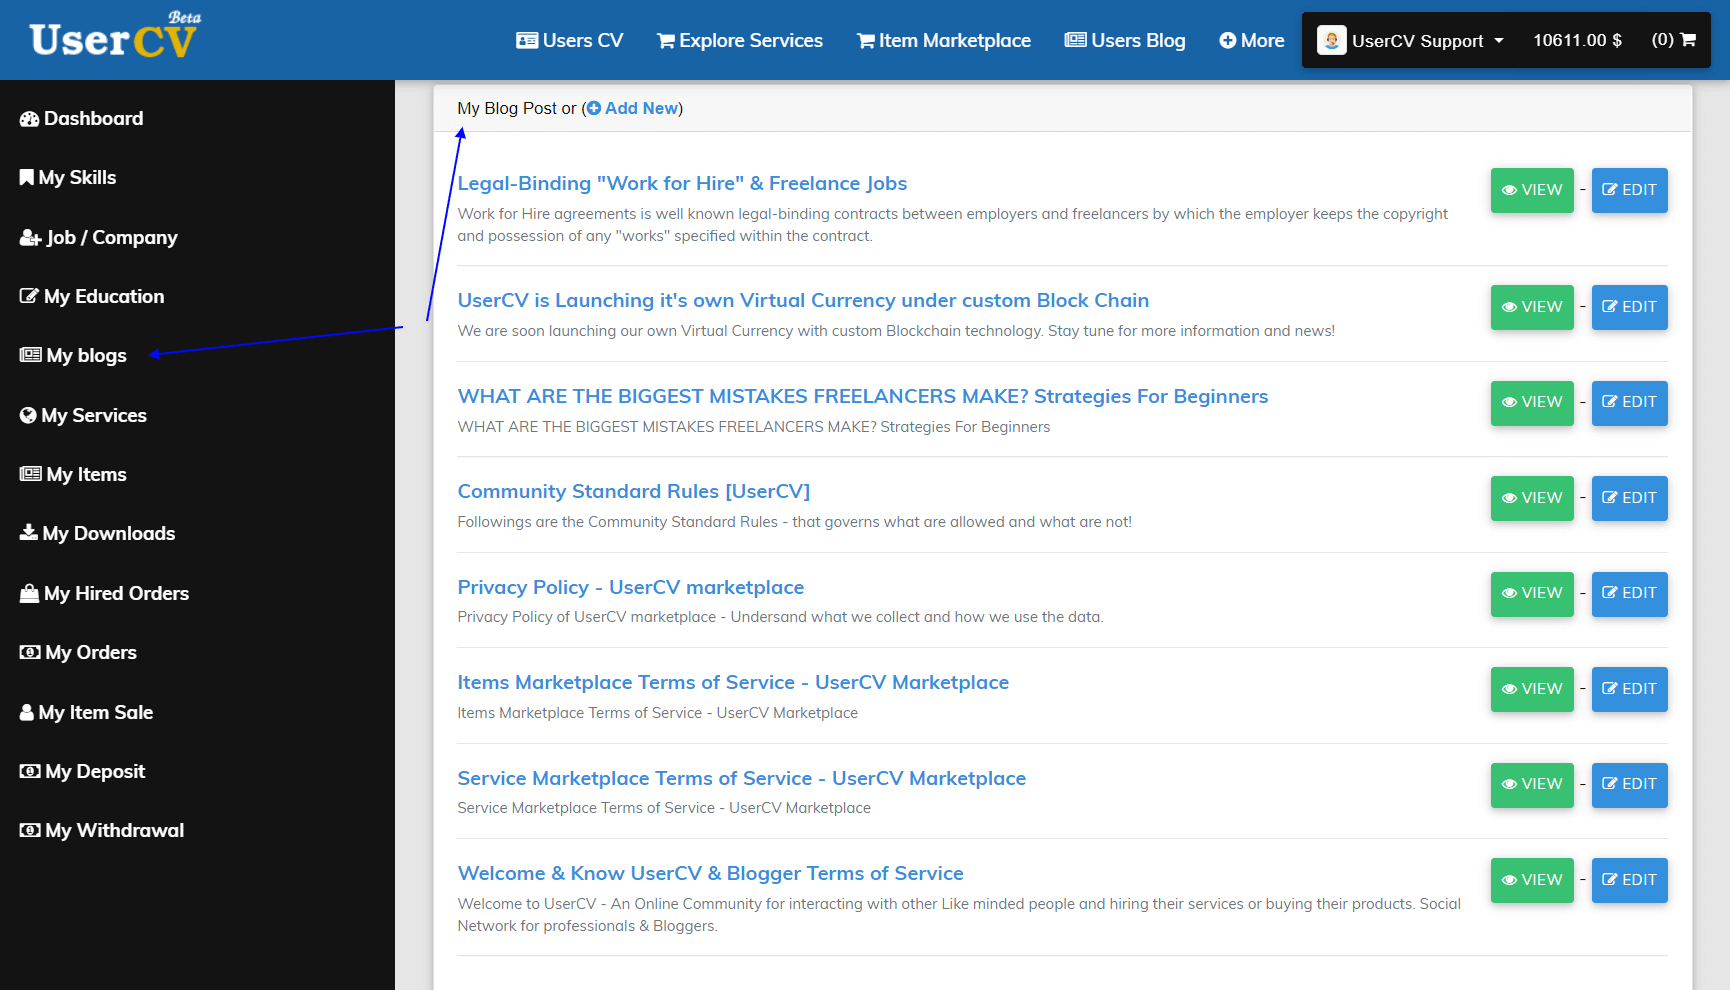 FreelancerCV - Fiverr Clone - Envato Clone - Tumblr Clone - About.me Clone (Multi Domain SAAS) - Blogger Dashboard